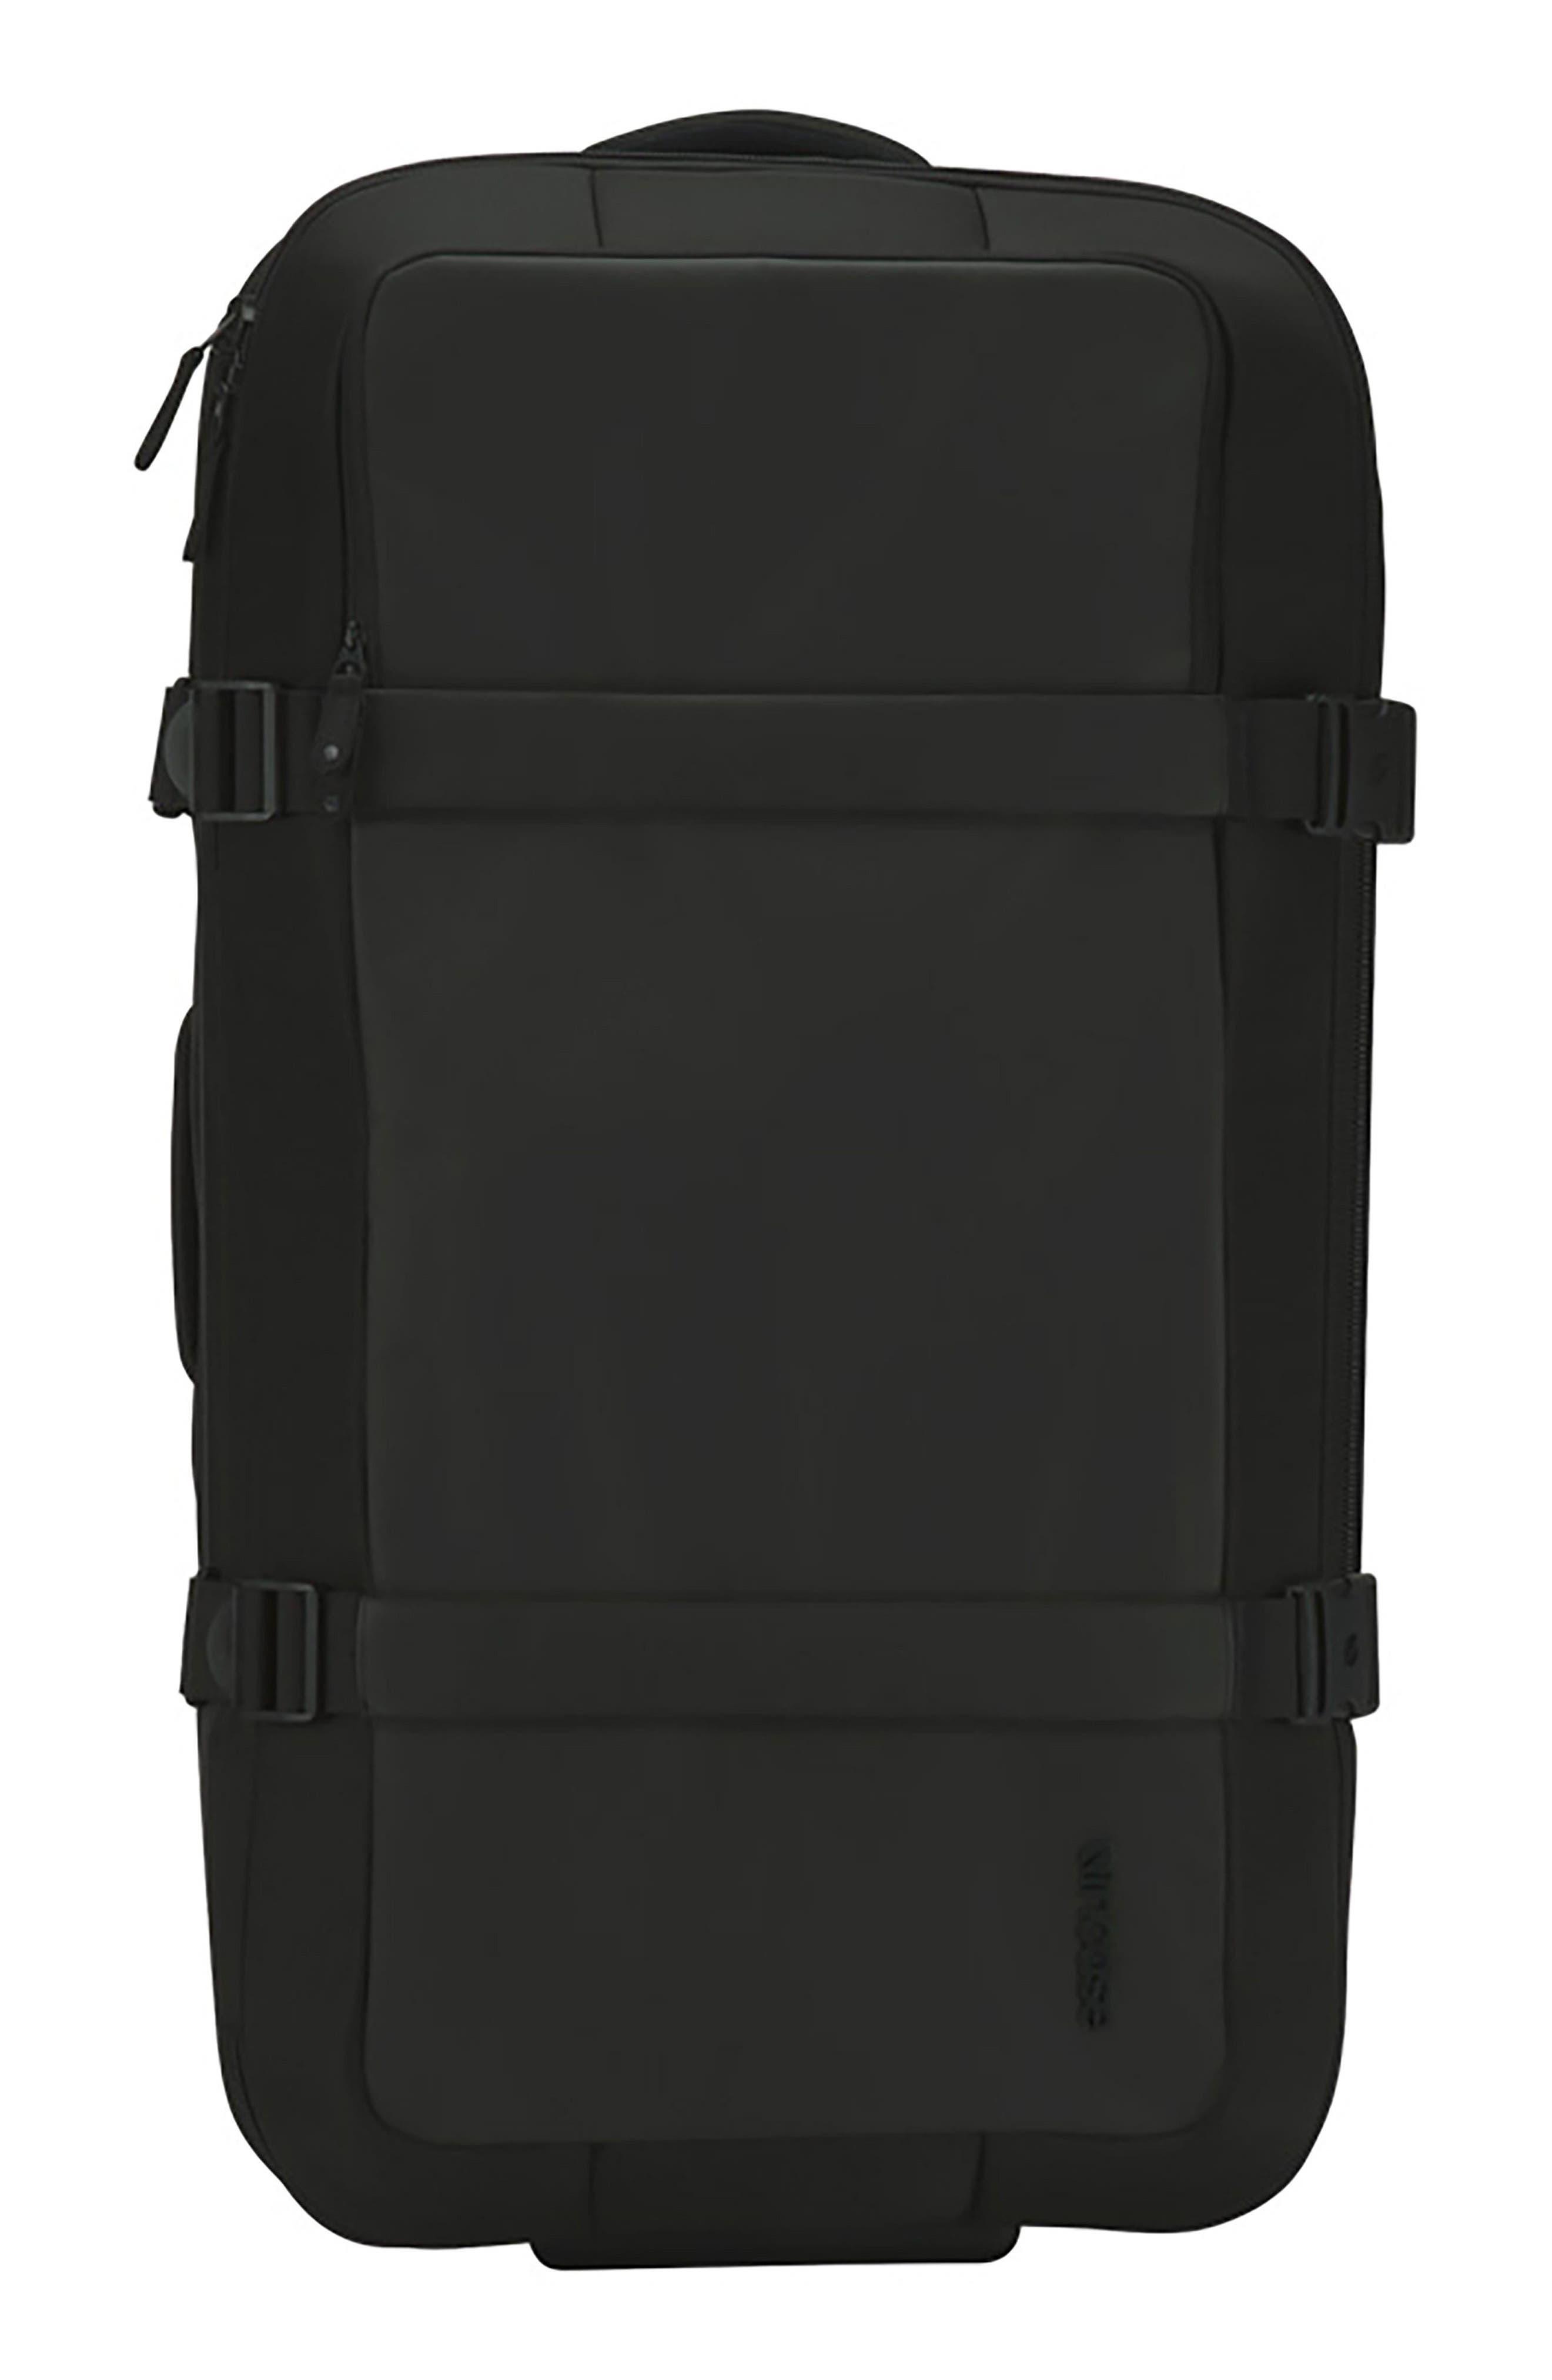 TRACTO 30-Inch Wheeled Duffel Bag,                             Main thumbnail 1, color,                             001